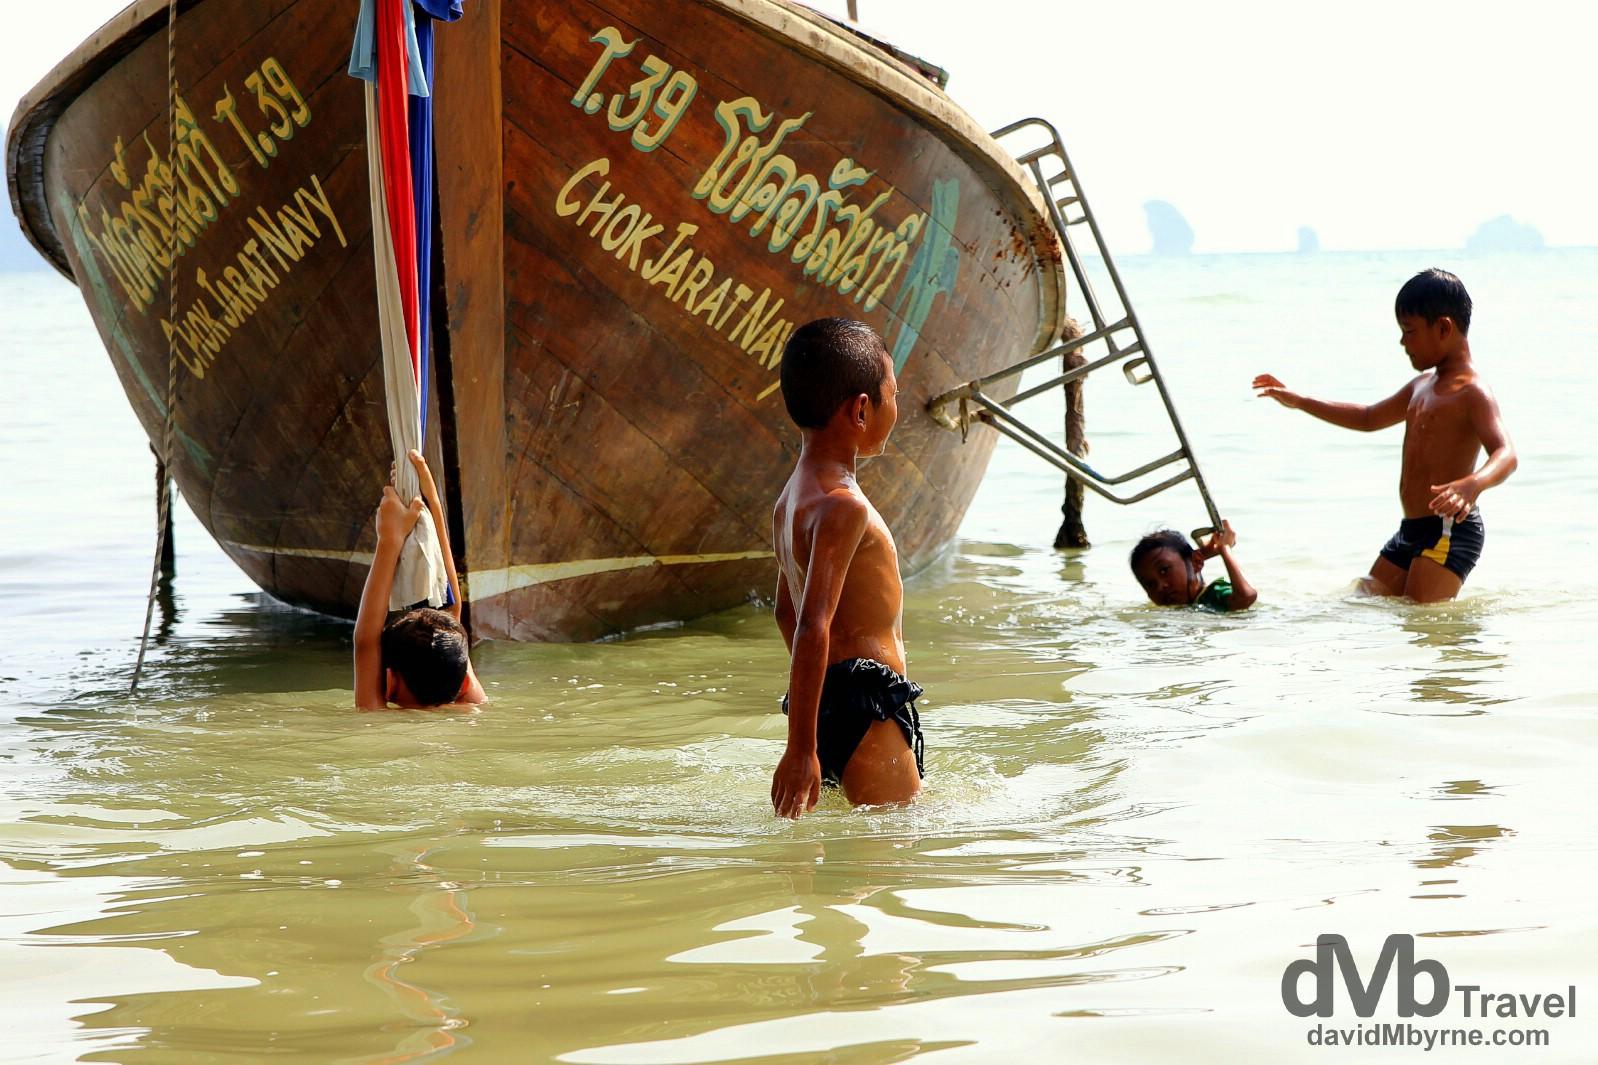 Kids Frolicking in the water off Hat Ton Sai Beach, Krabi, Thailand. March 18th 2012